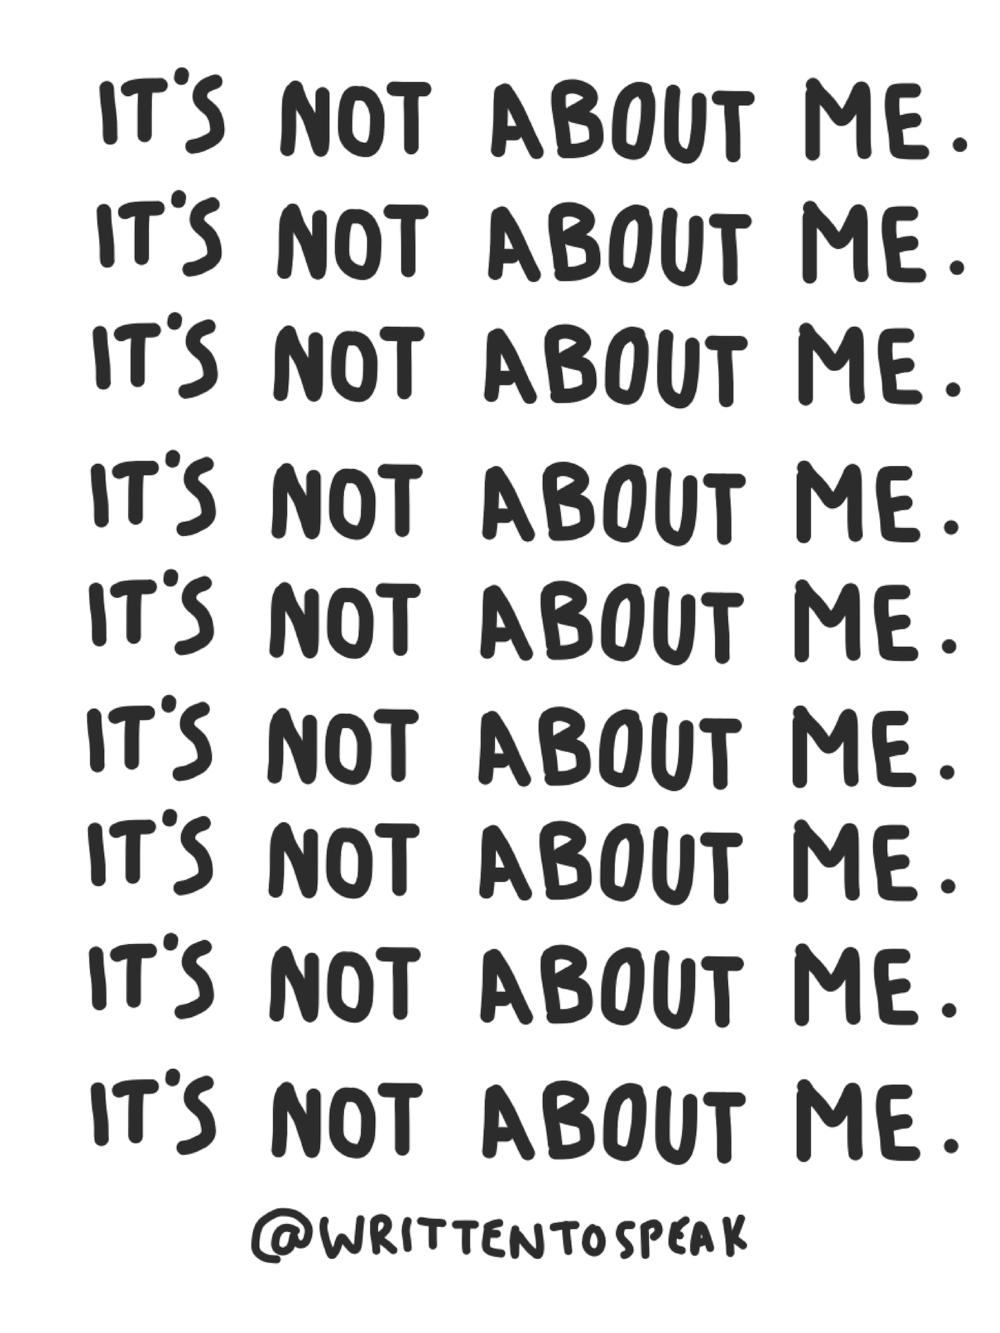 written to speak blog it's not about me